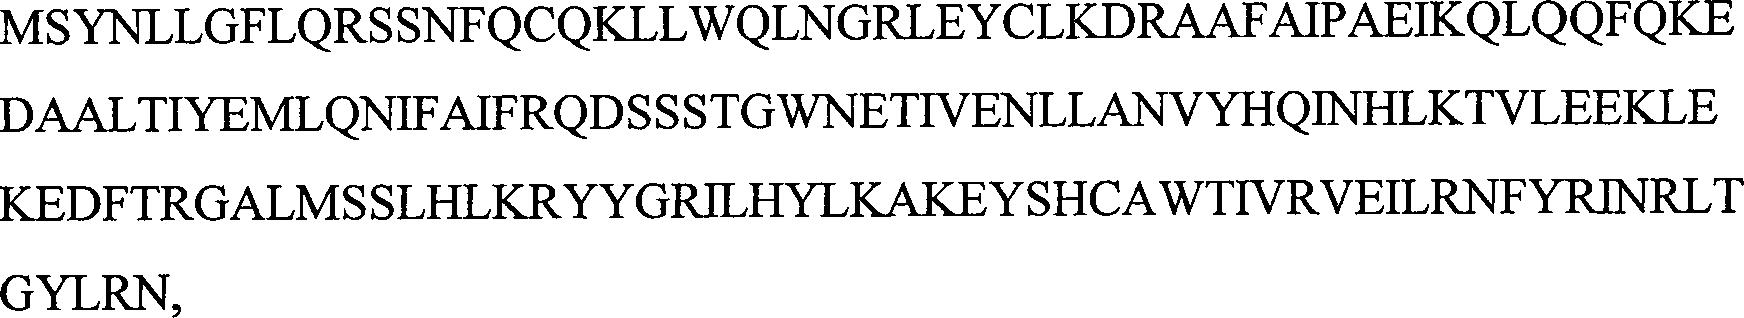 Figure 00690003